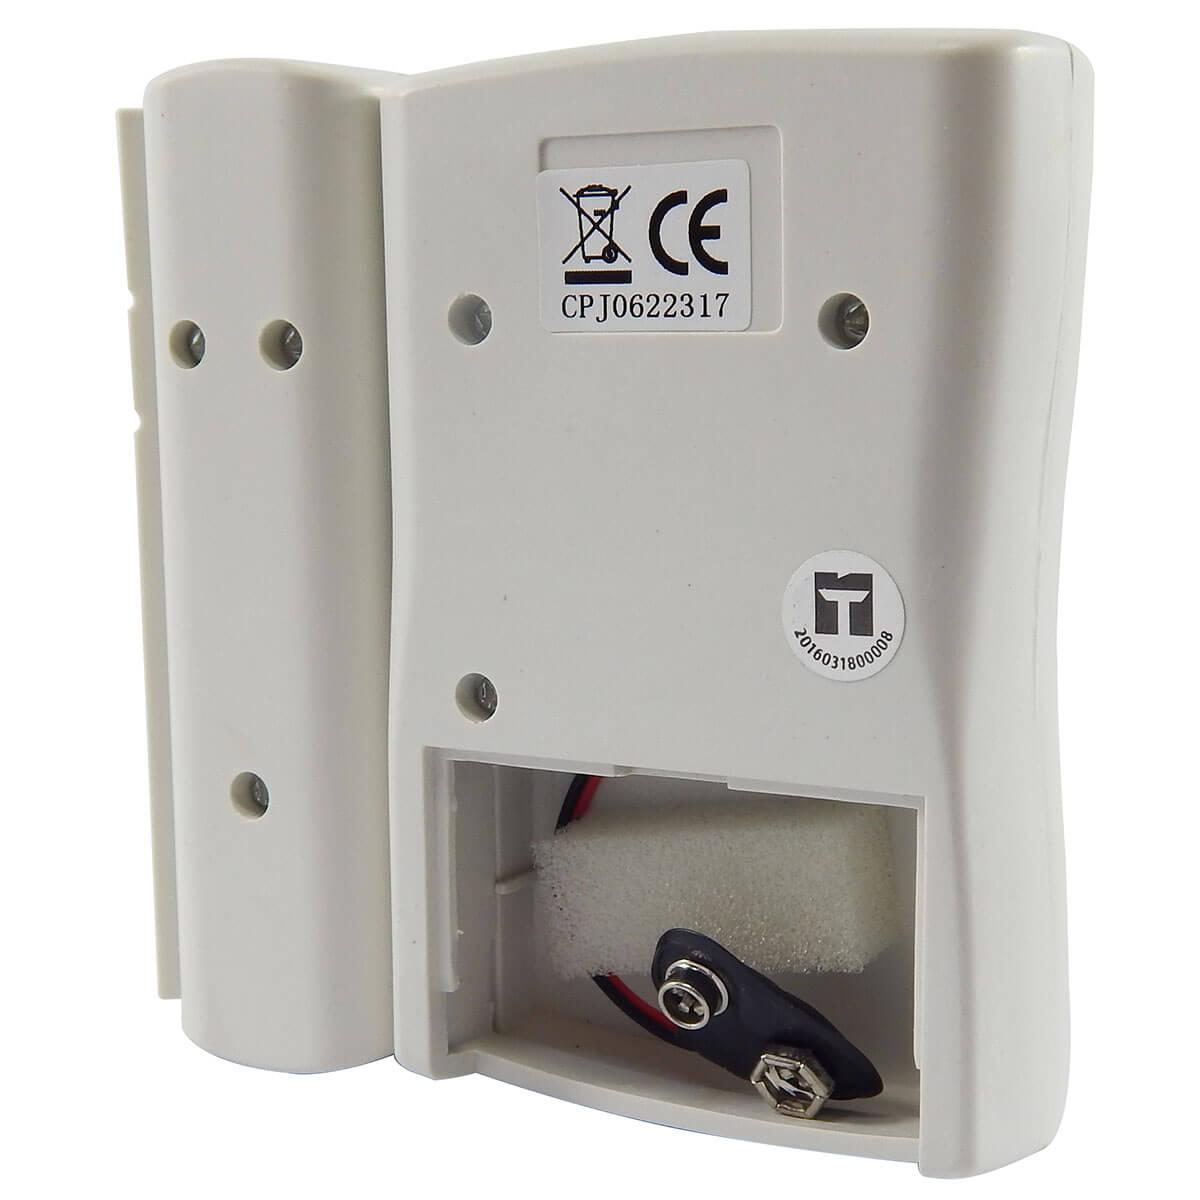 KIT Alicate p/ Crimpagem RJ45 e RJ11 + Testador de Cabos RJ45 + Alicate p/ Crimpar Coaxial + Alicate Decapador Cabo Coaxial + 50x Conectores RJ45 + Multímetro DT-830B